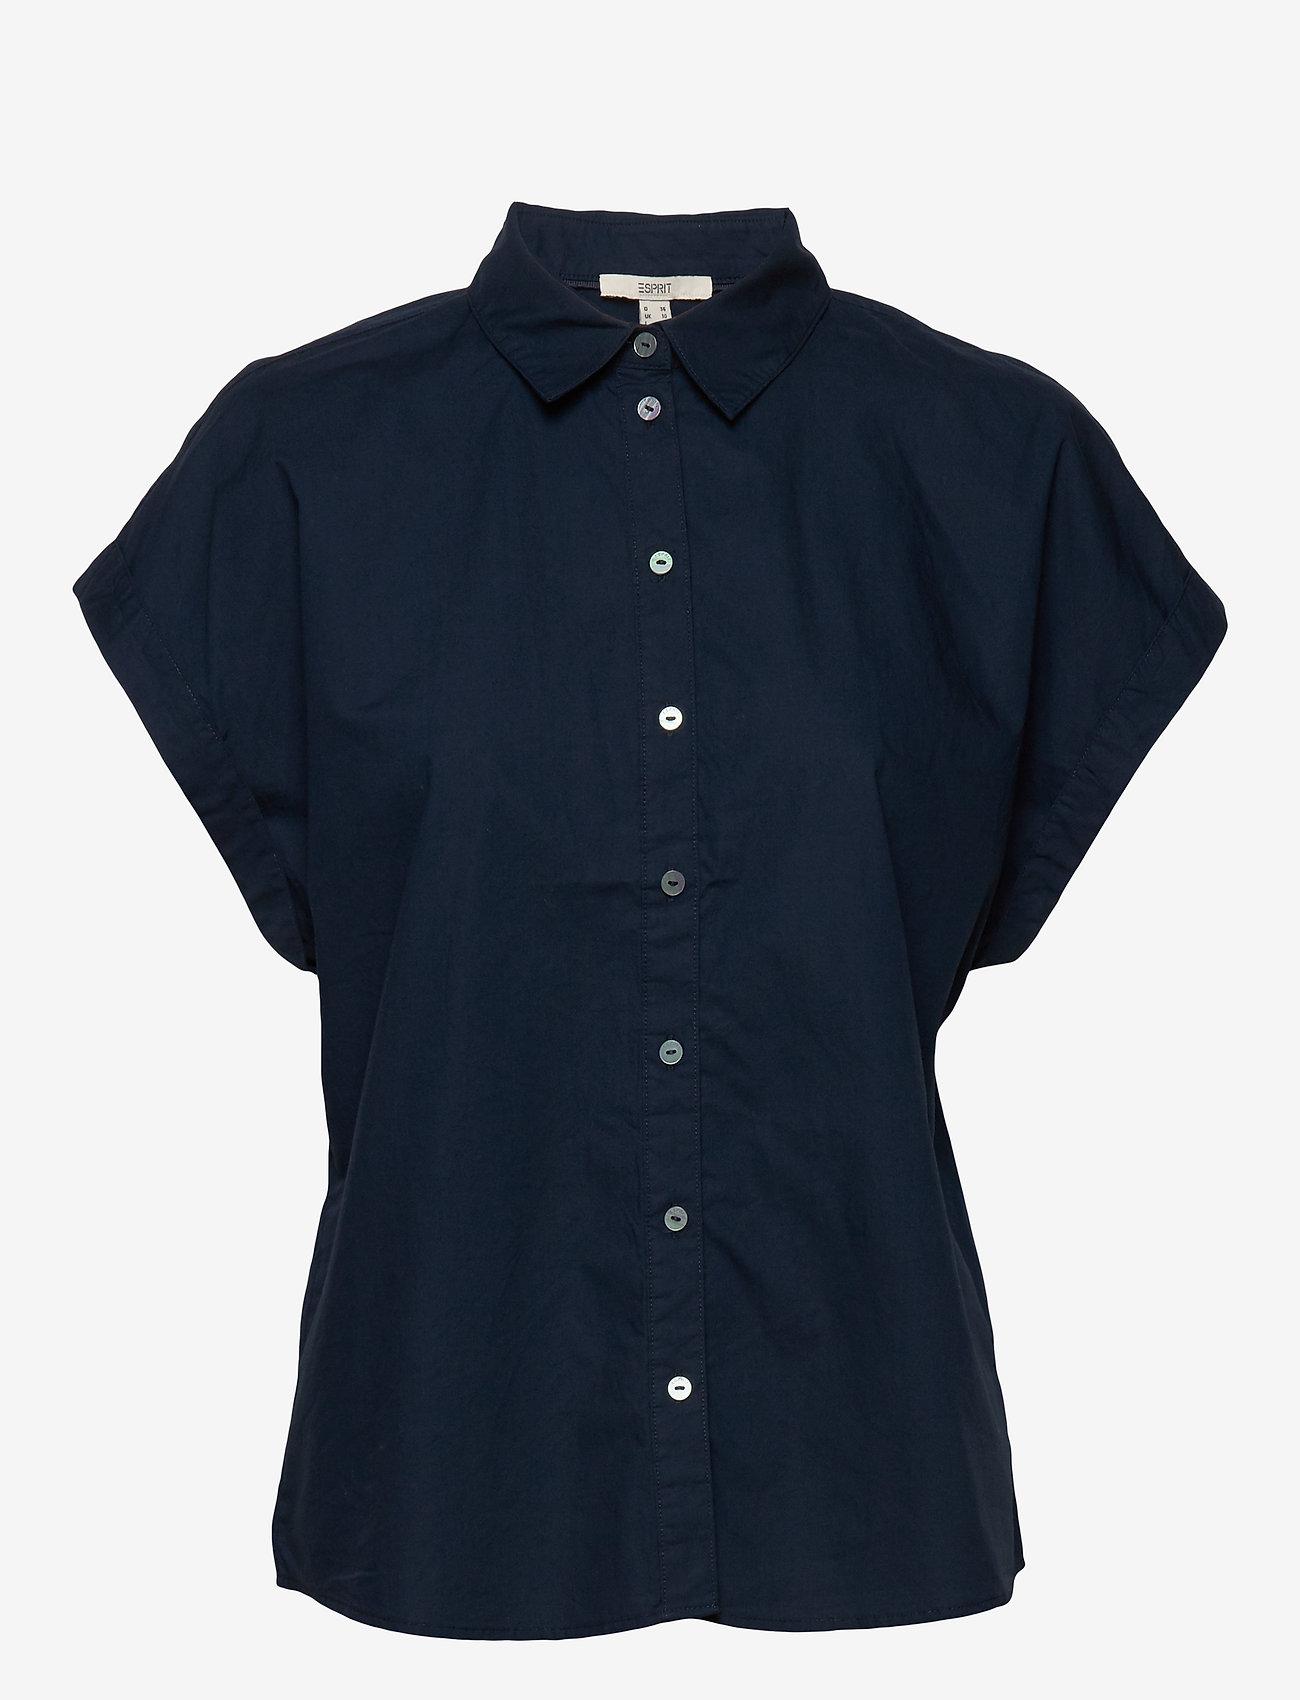 Esprit Casual - Blouses woven - kortermede skjorter - navy - 0